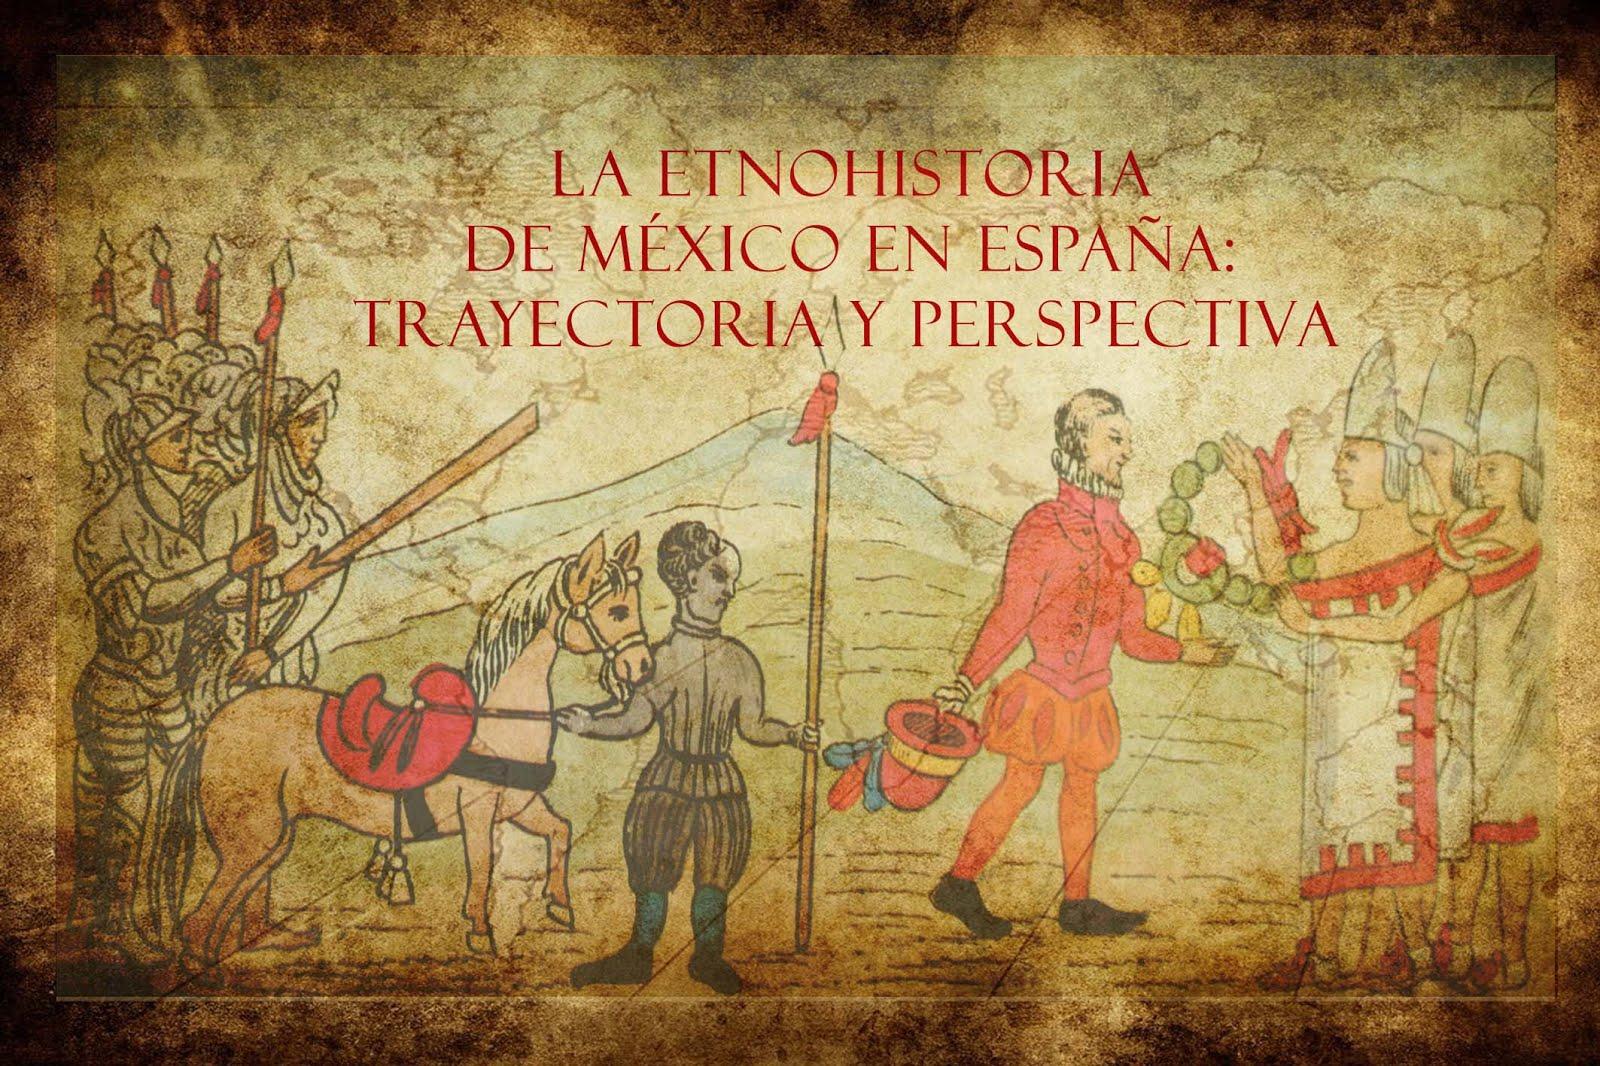 Etnohistoria ENAH Blog: 2017